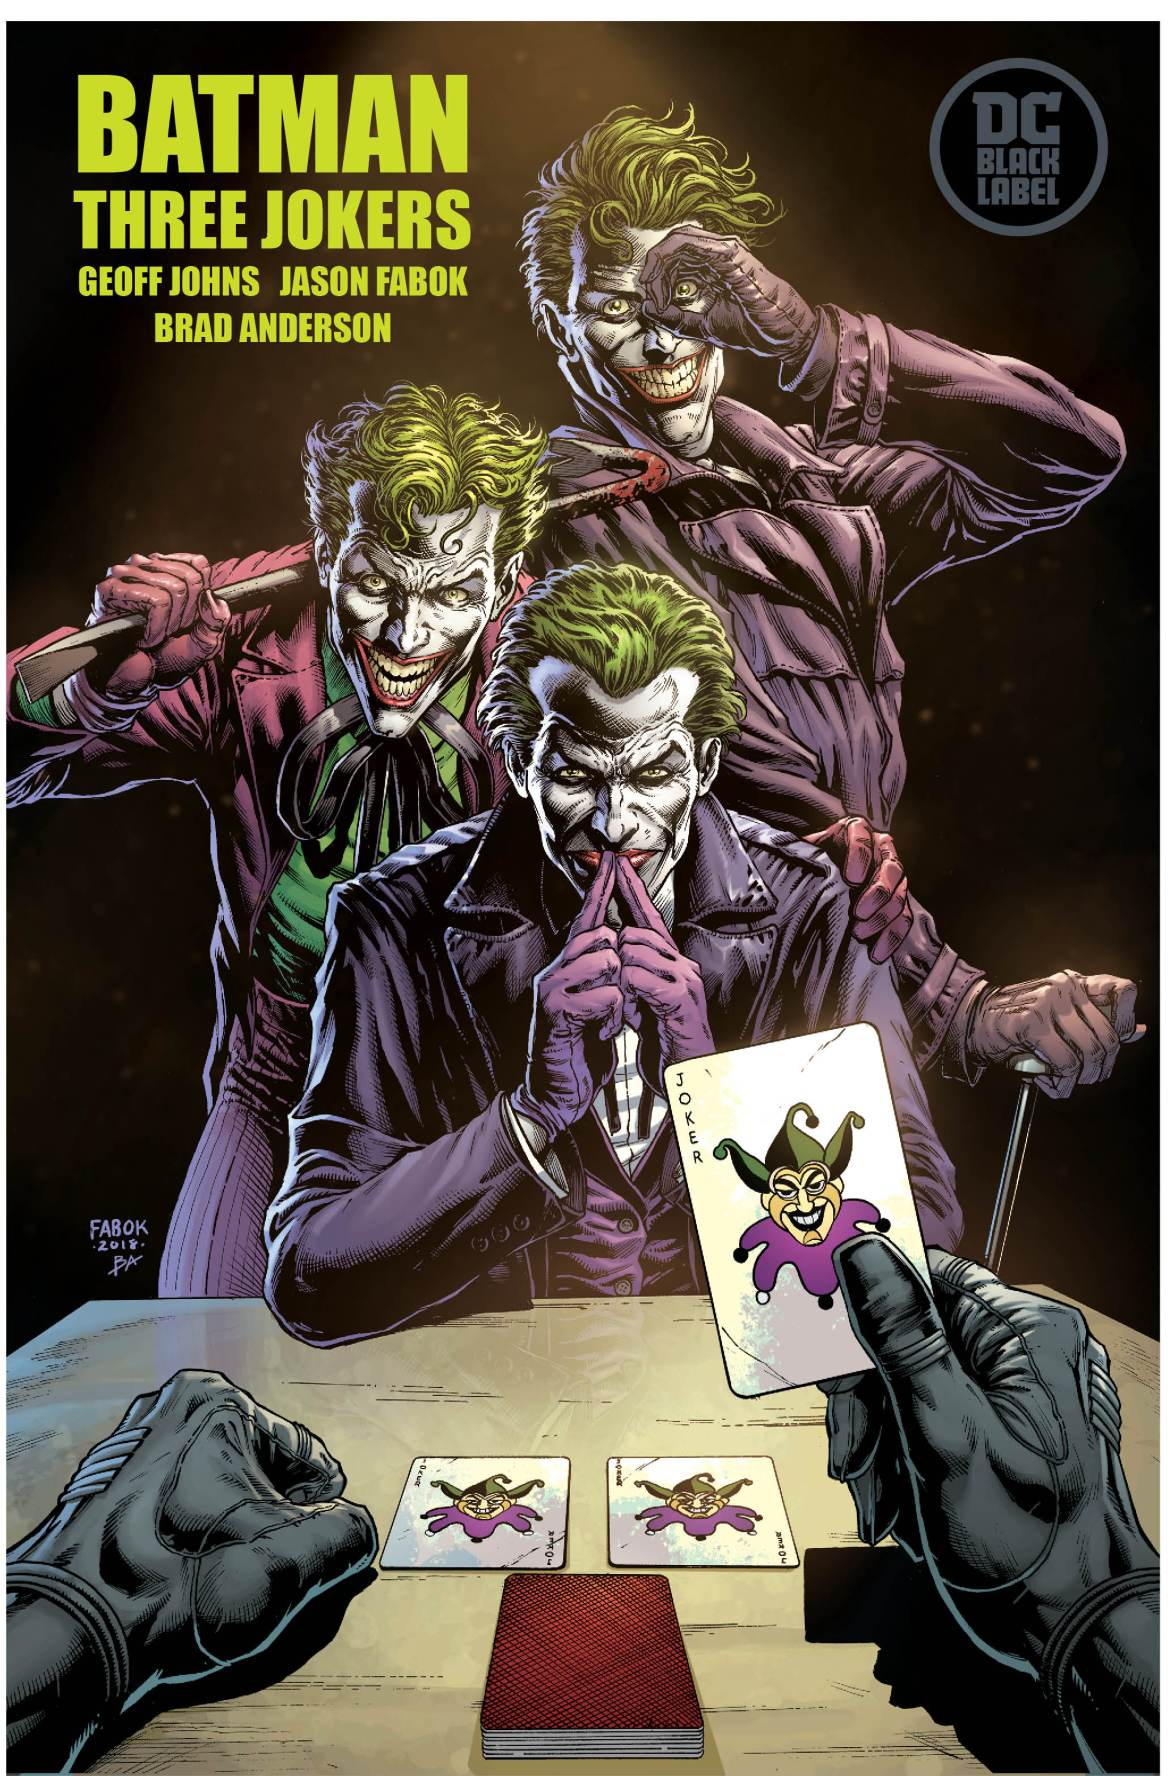 sdcc2018 dc comics news three jokers